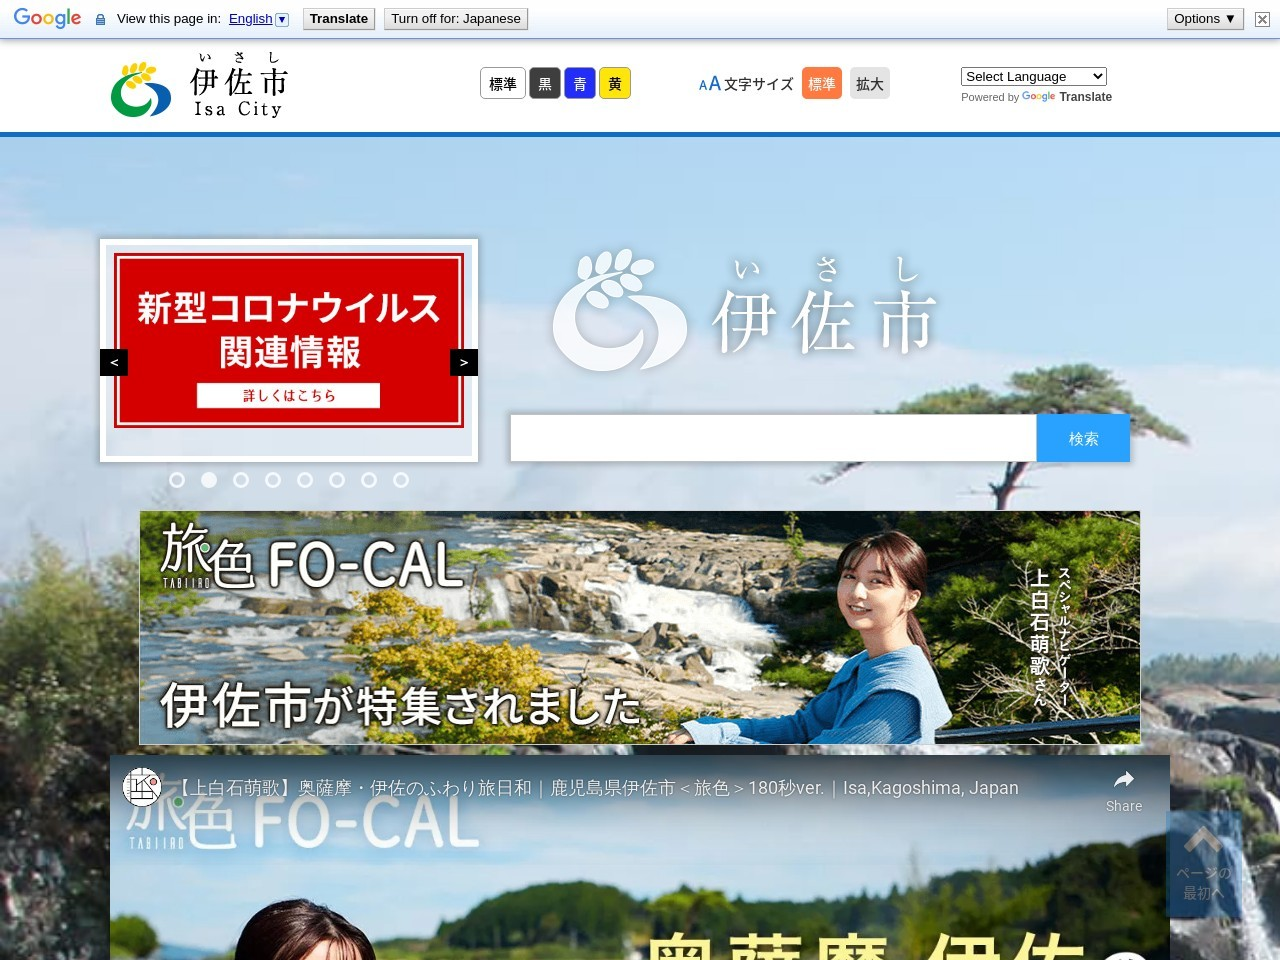 http://www.city.isa.kagoshima.jp/event/2018/_102930_10001500.html